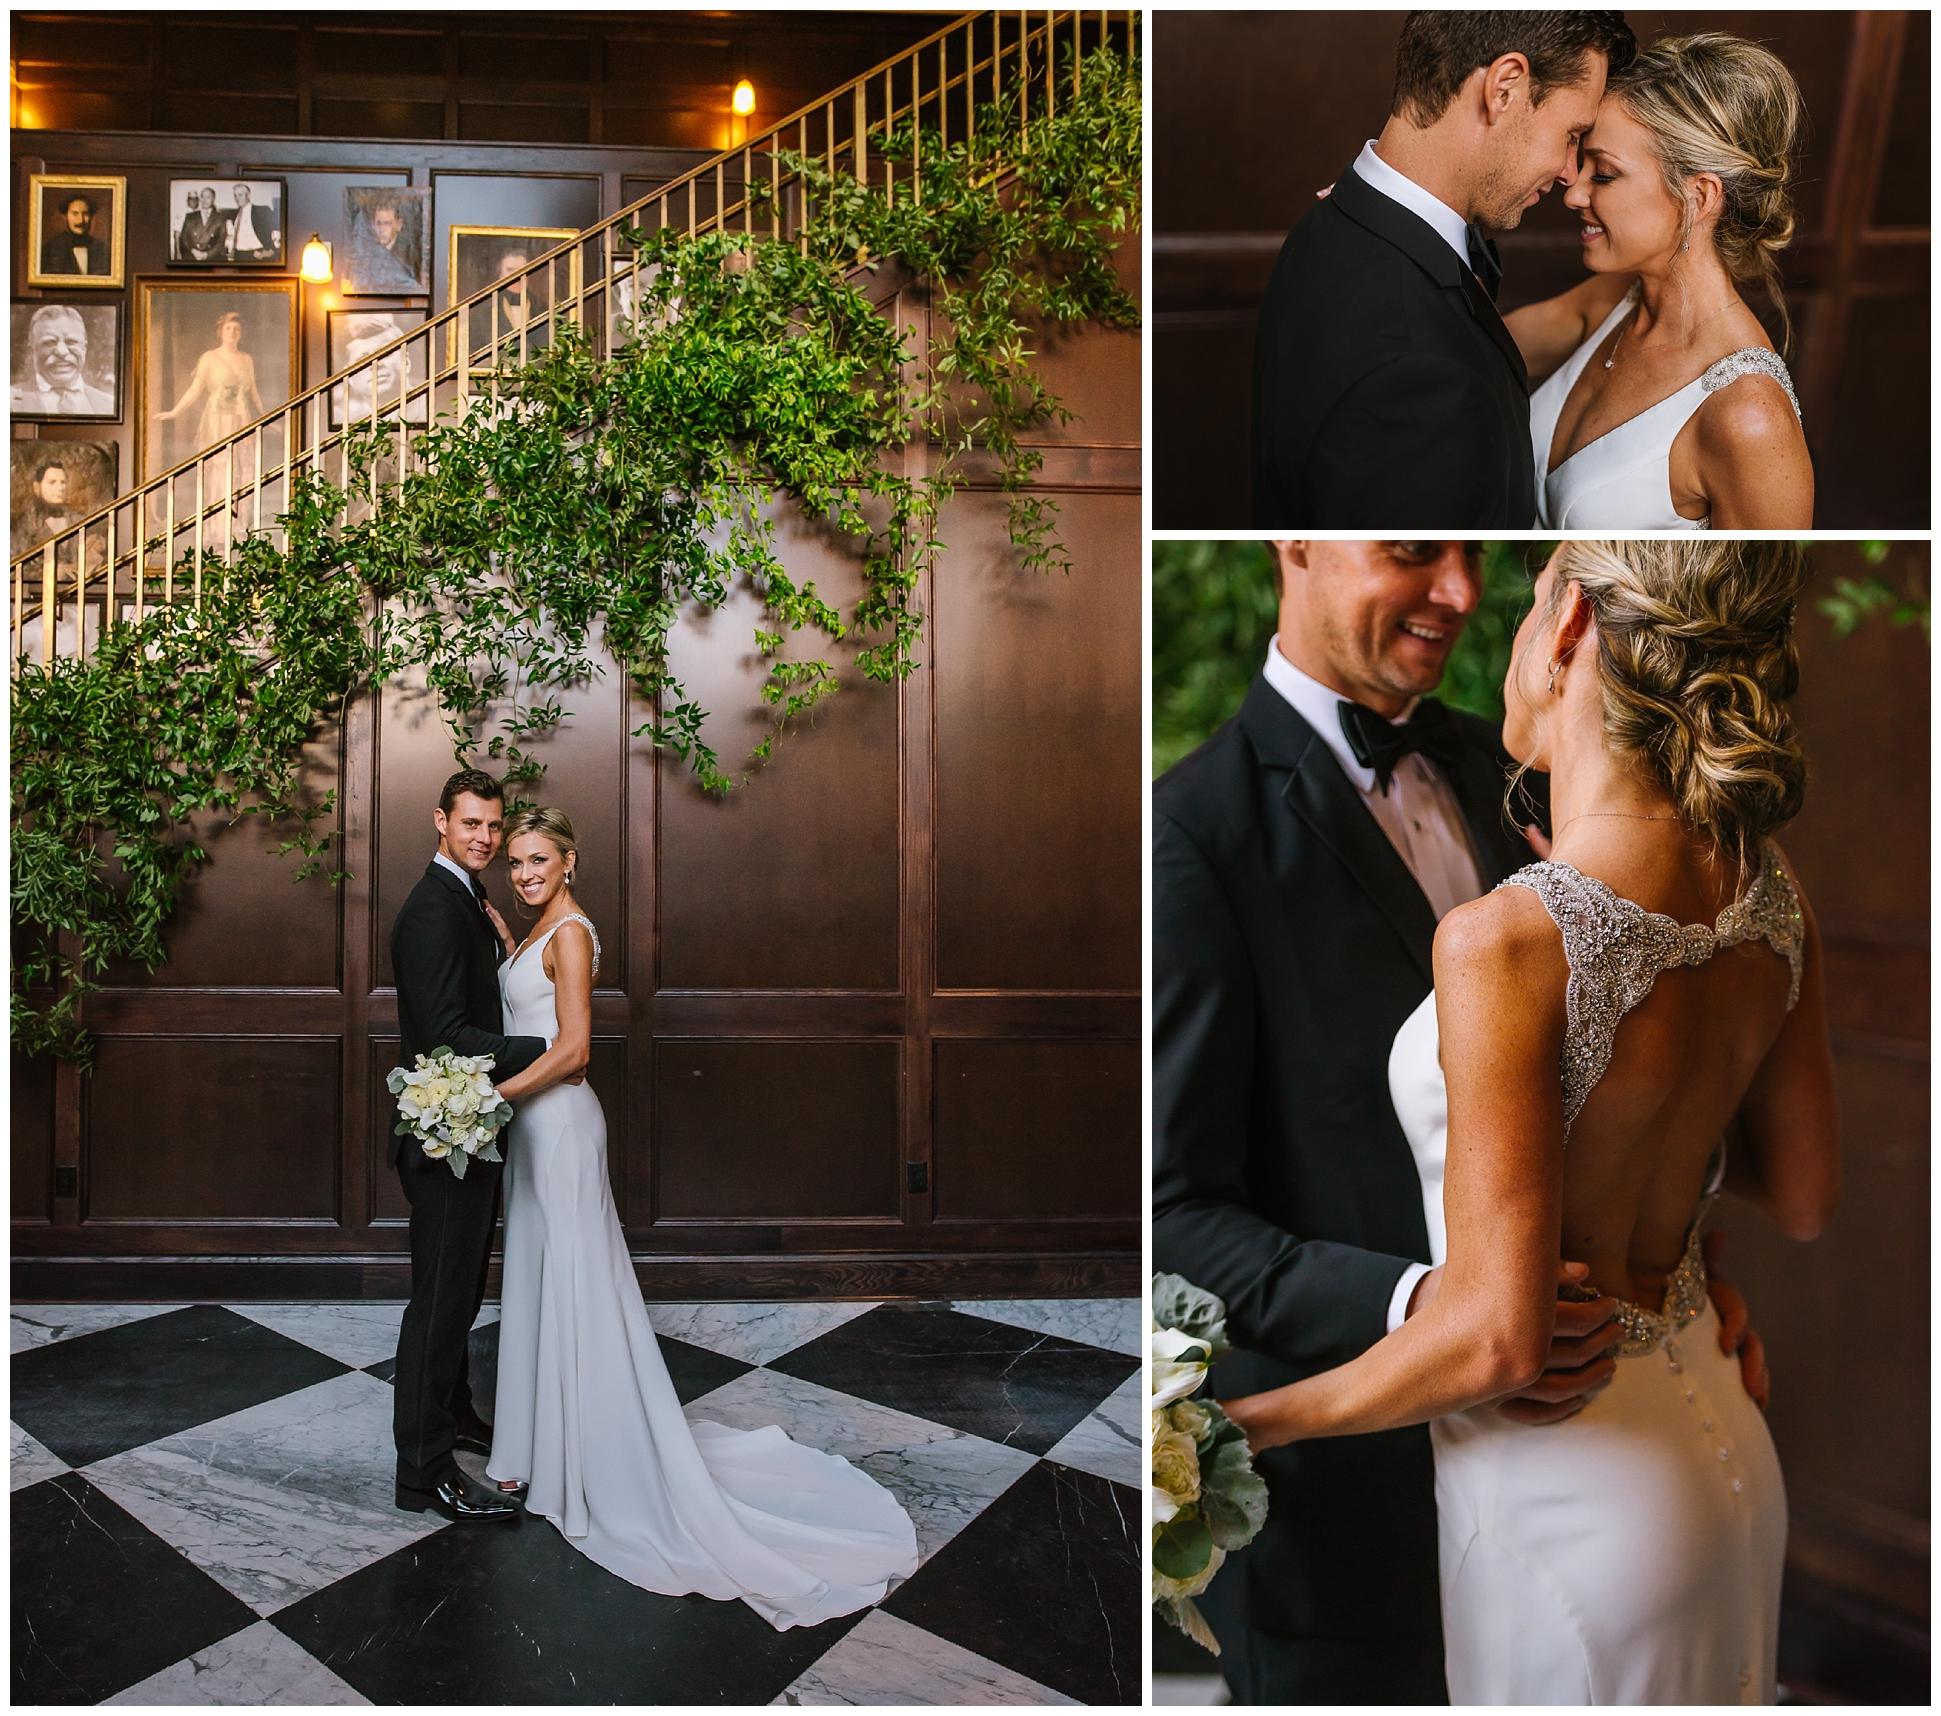 Oxford-exchange-wedding-photogapher-garland-candels-bookstore-burgandy-botanica_0034.jpg